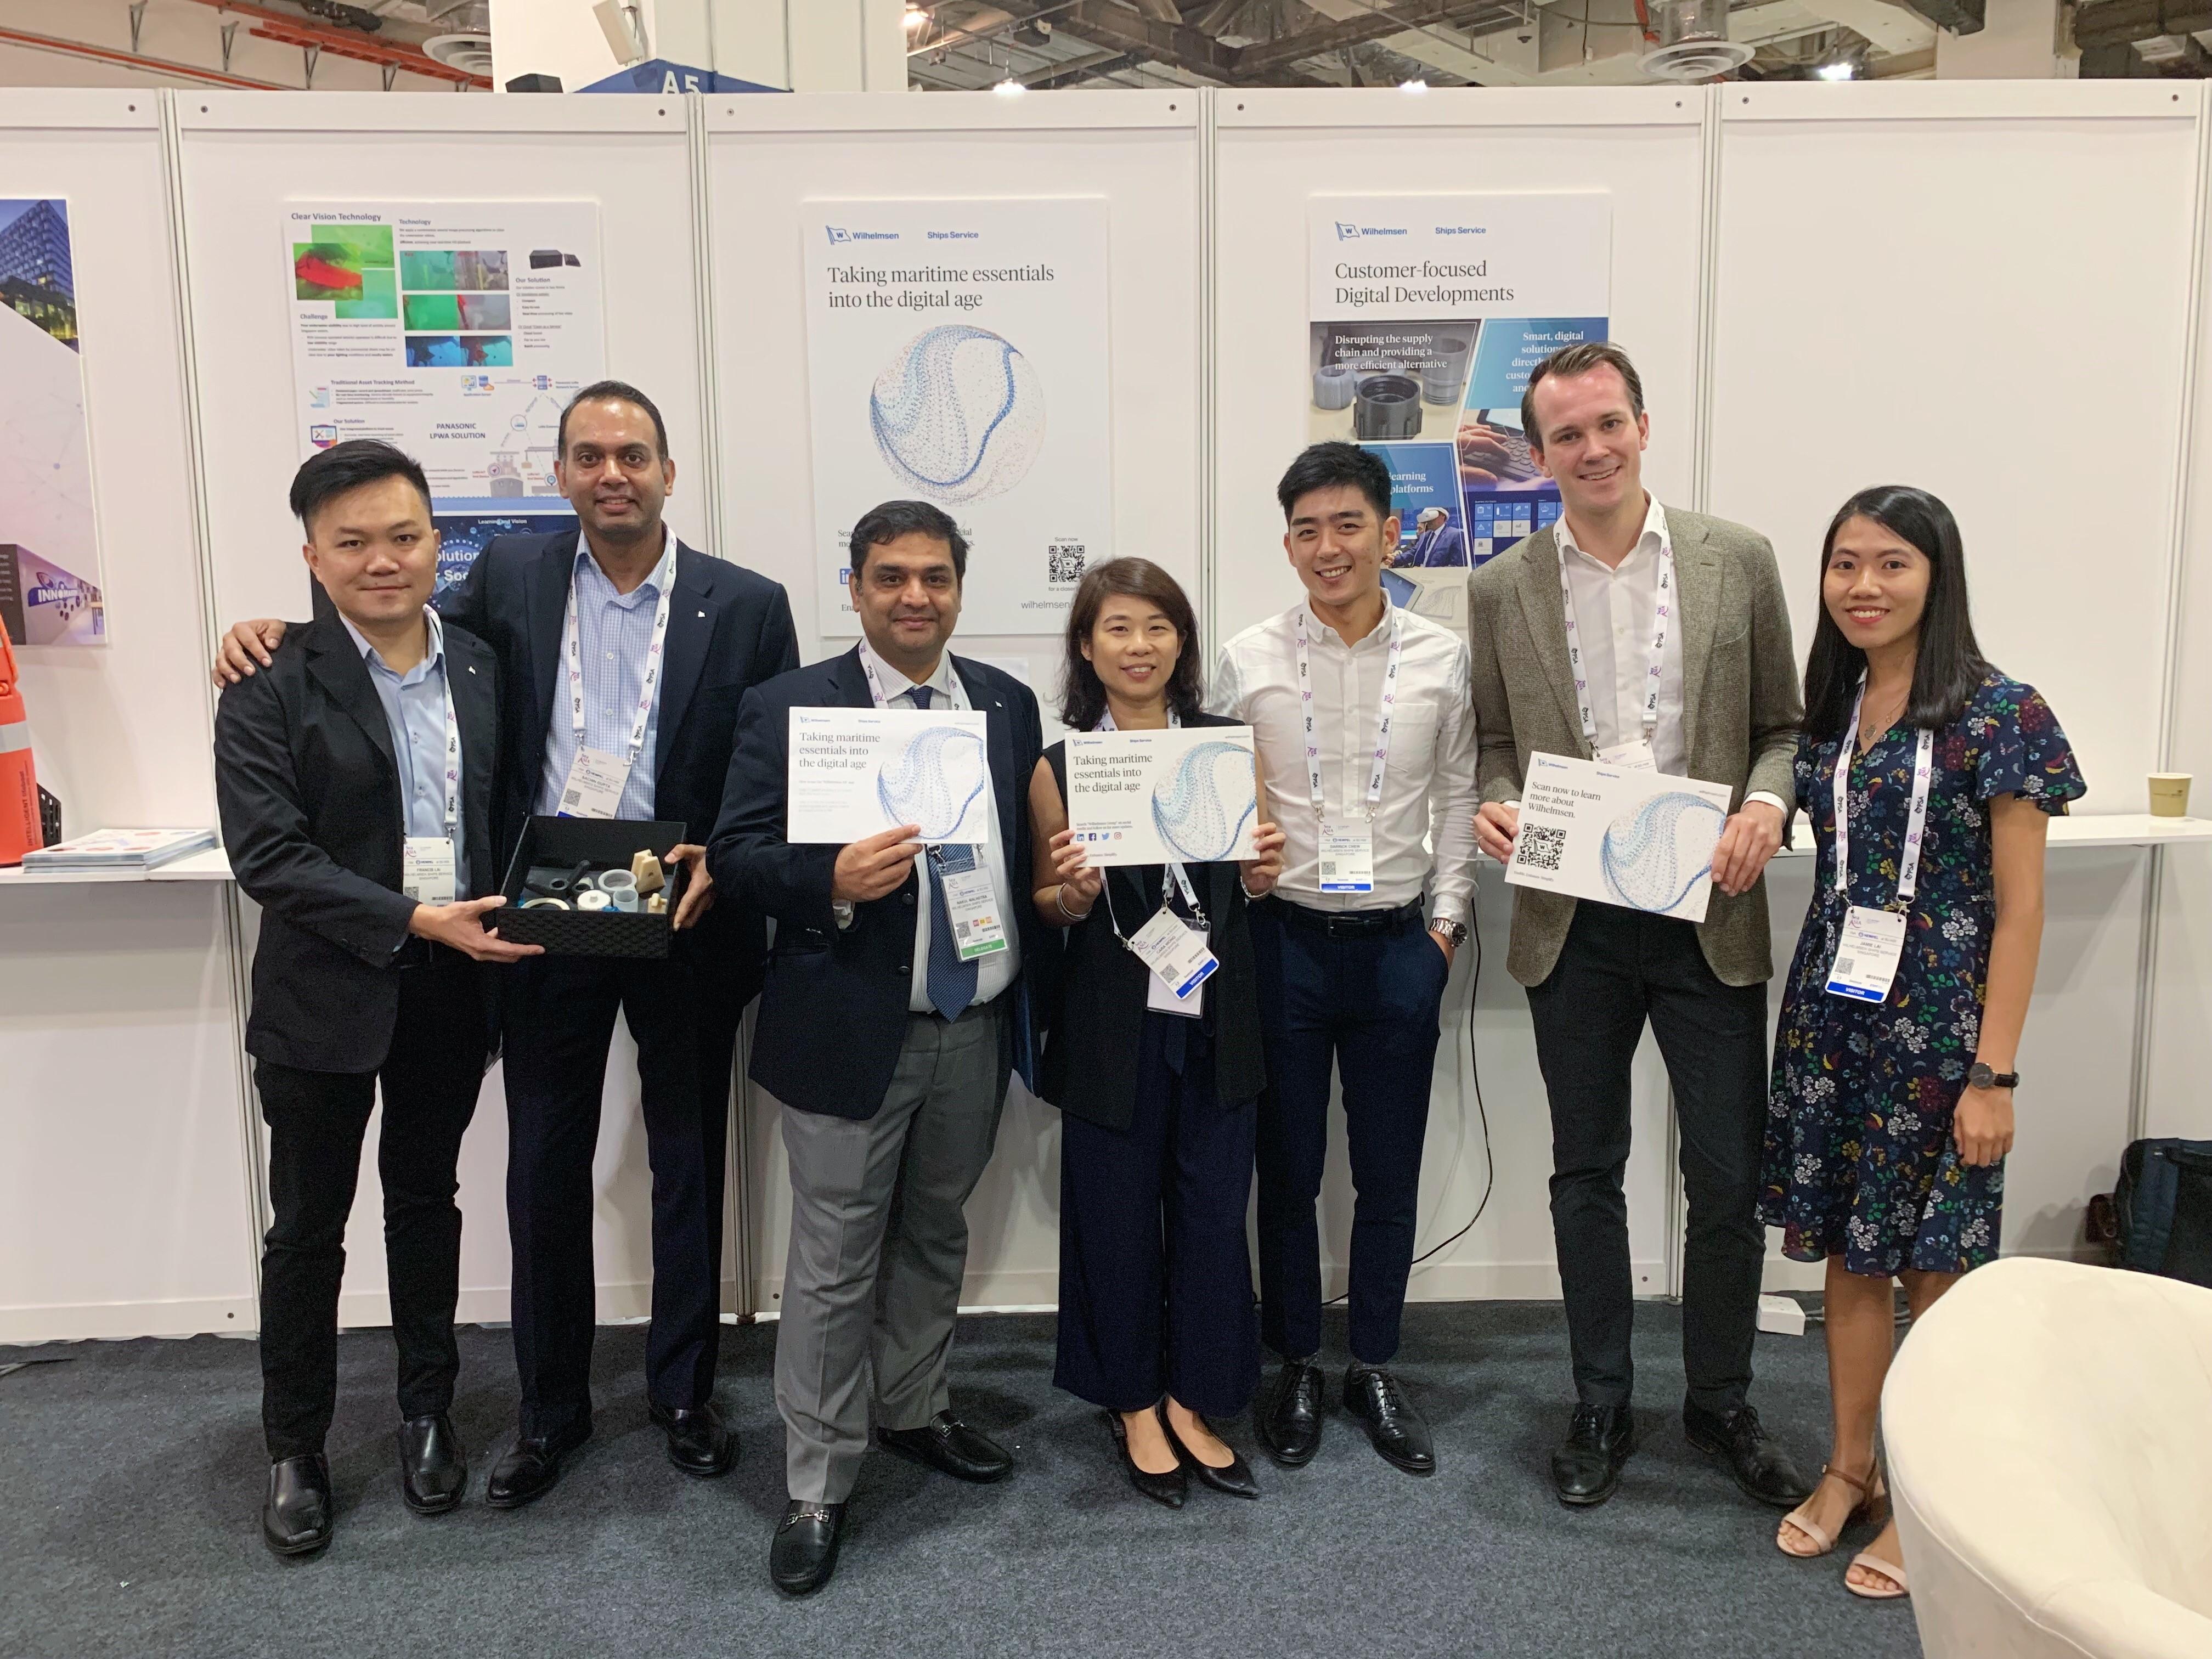 Spotlighting digital initiatives at Singapore Maritime Week